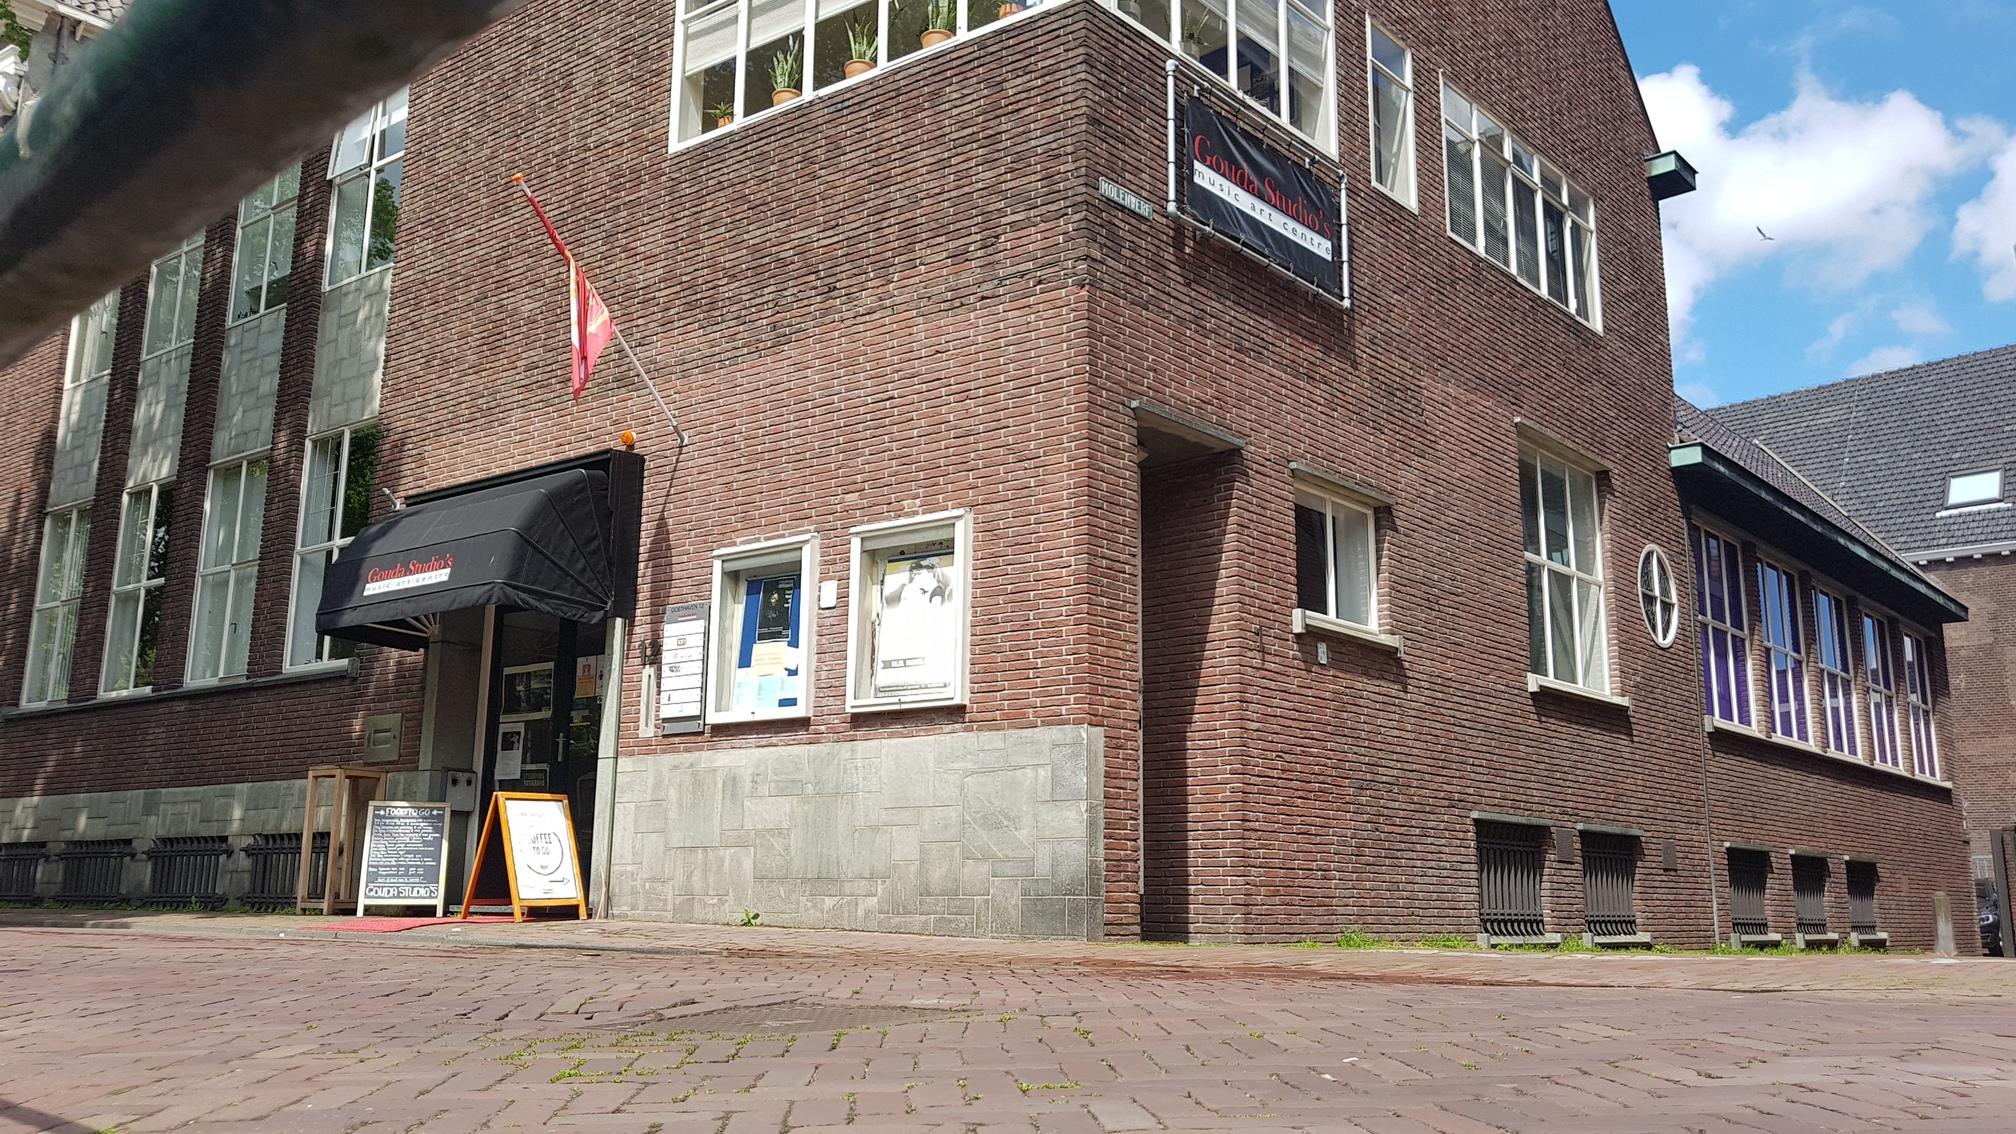 Praktijkruimte Wutah aan de Molenwerf 1 (hoek Oosthaven 12)n